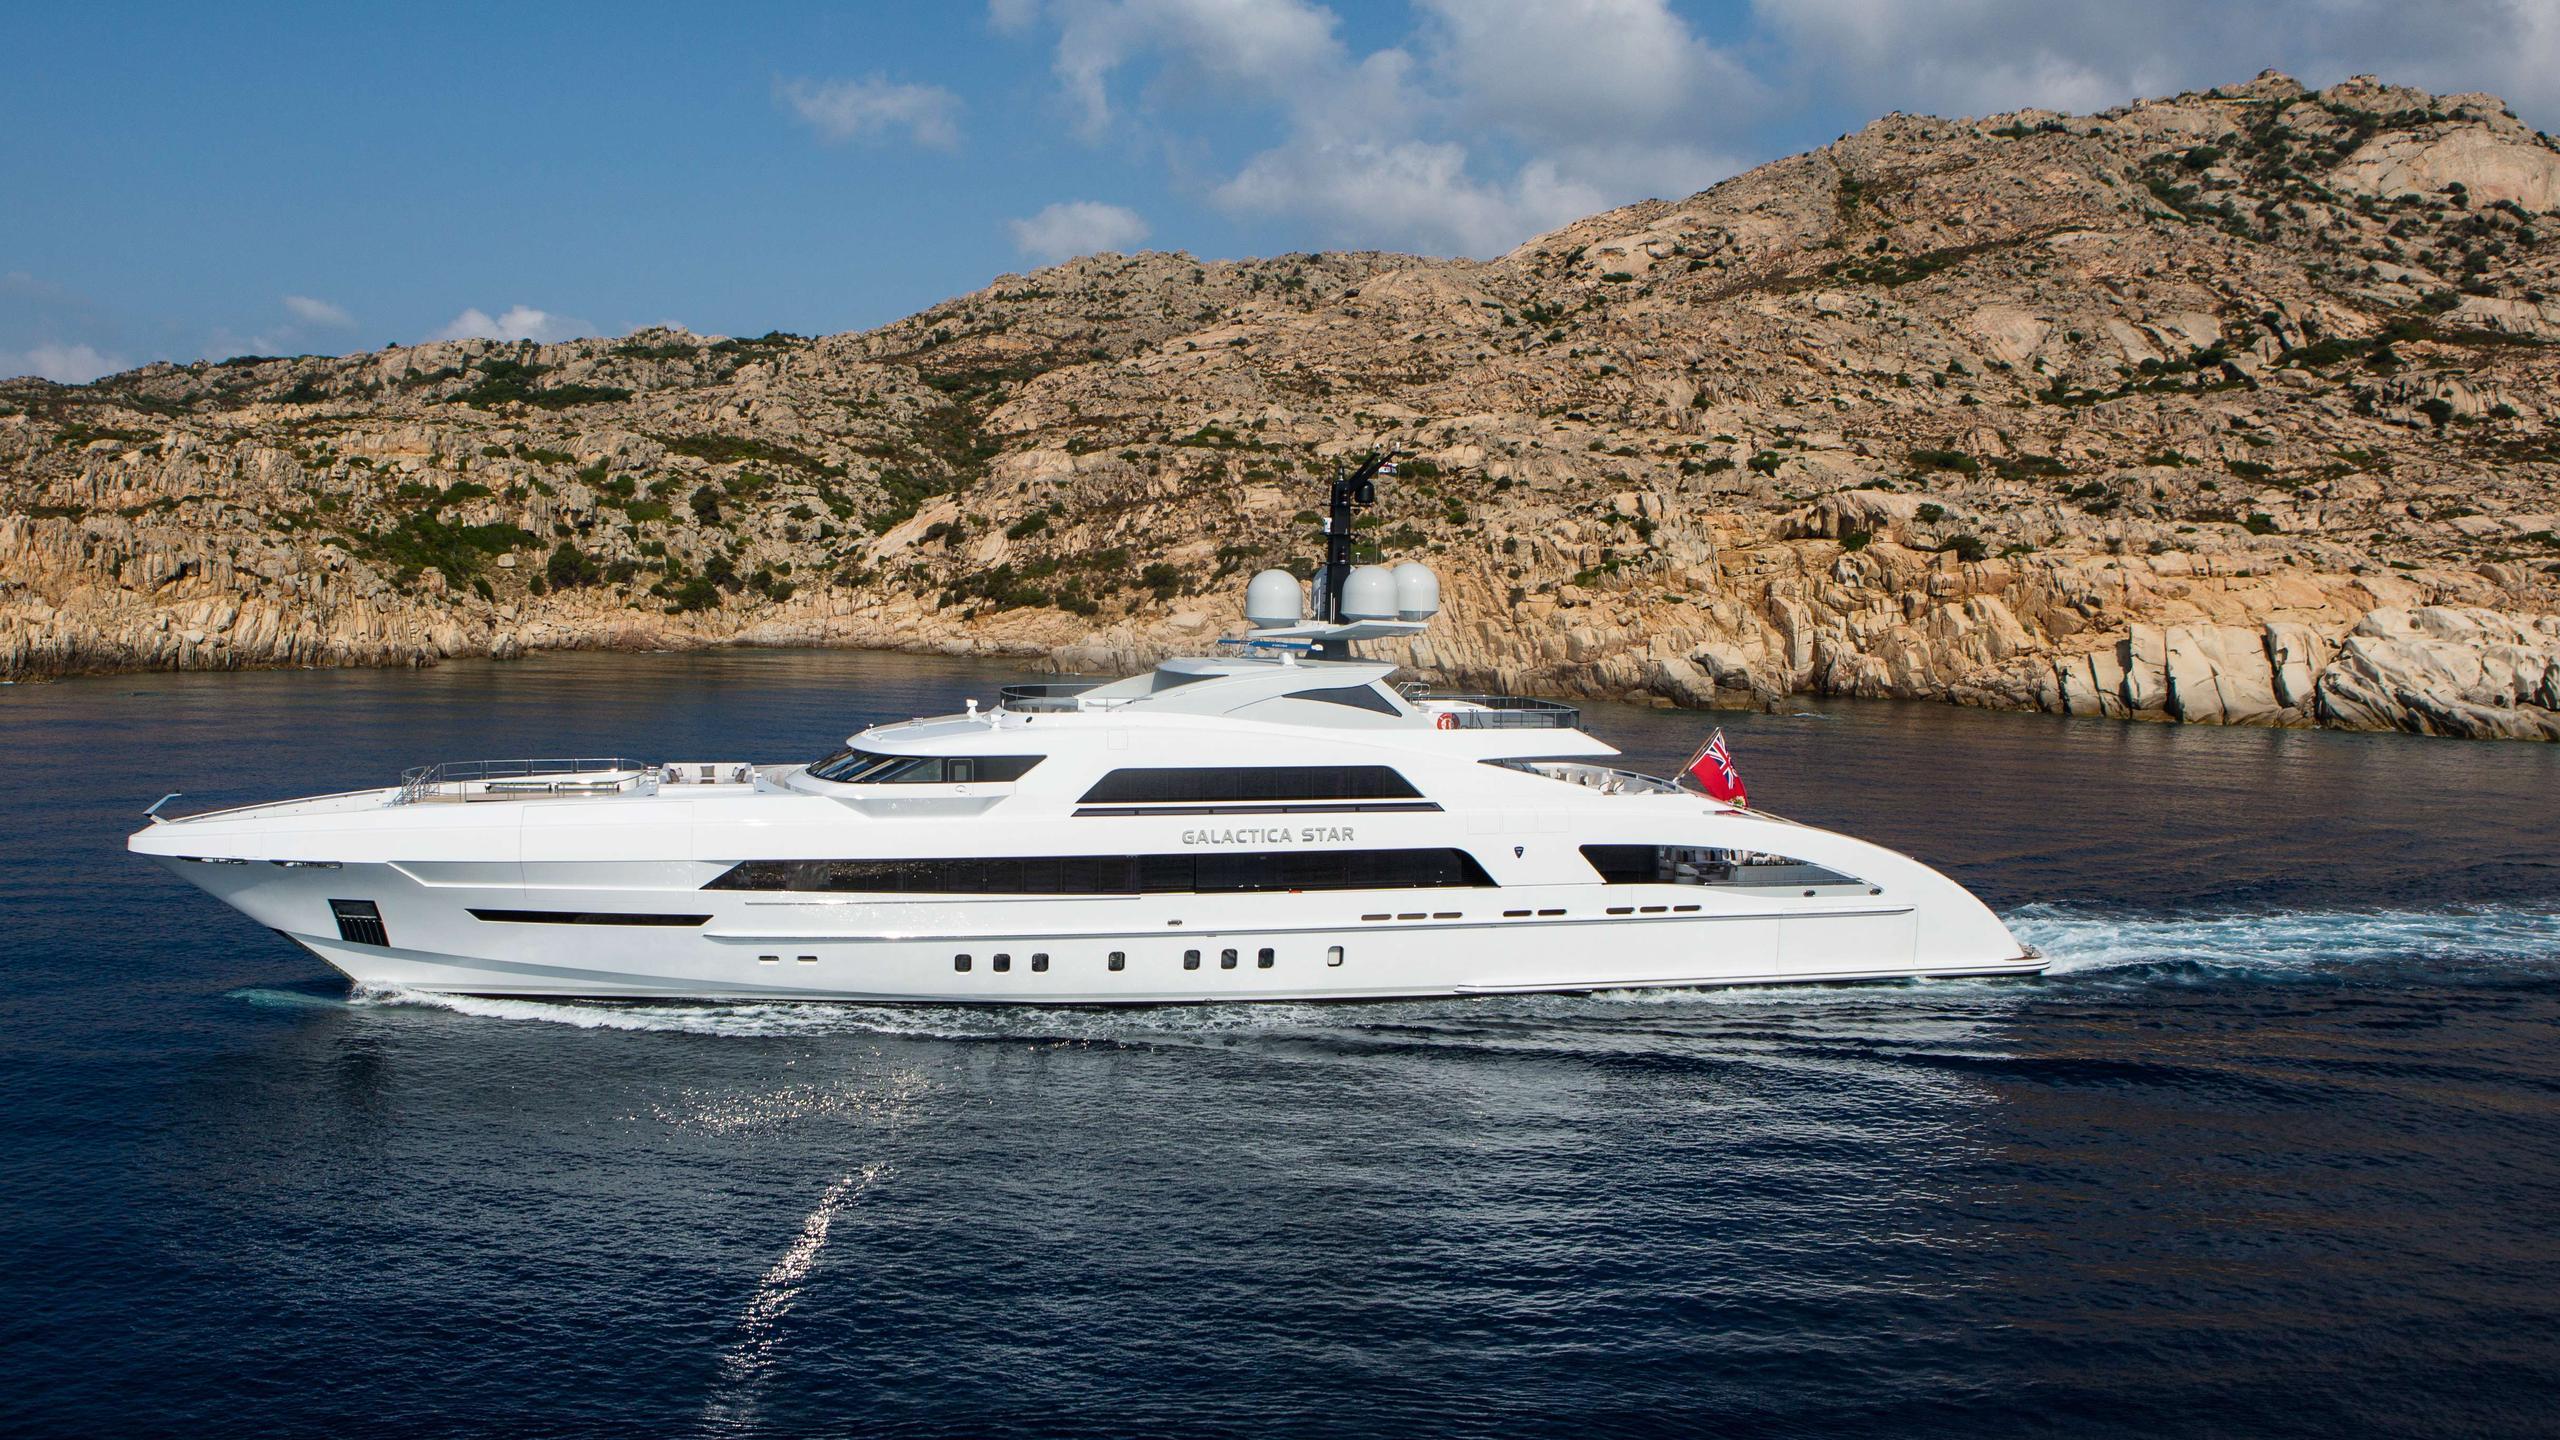 Galactica-Star-motor-yacht-heesen-2013-65m-cruising-profile